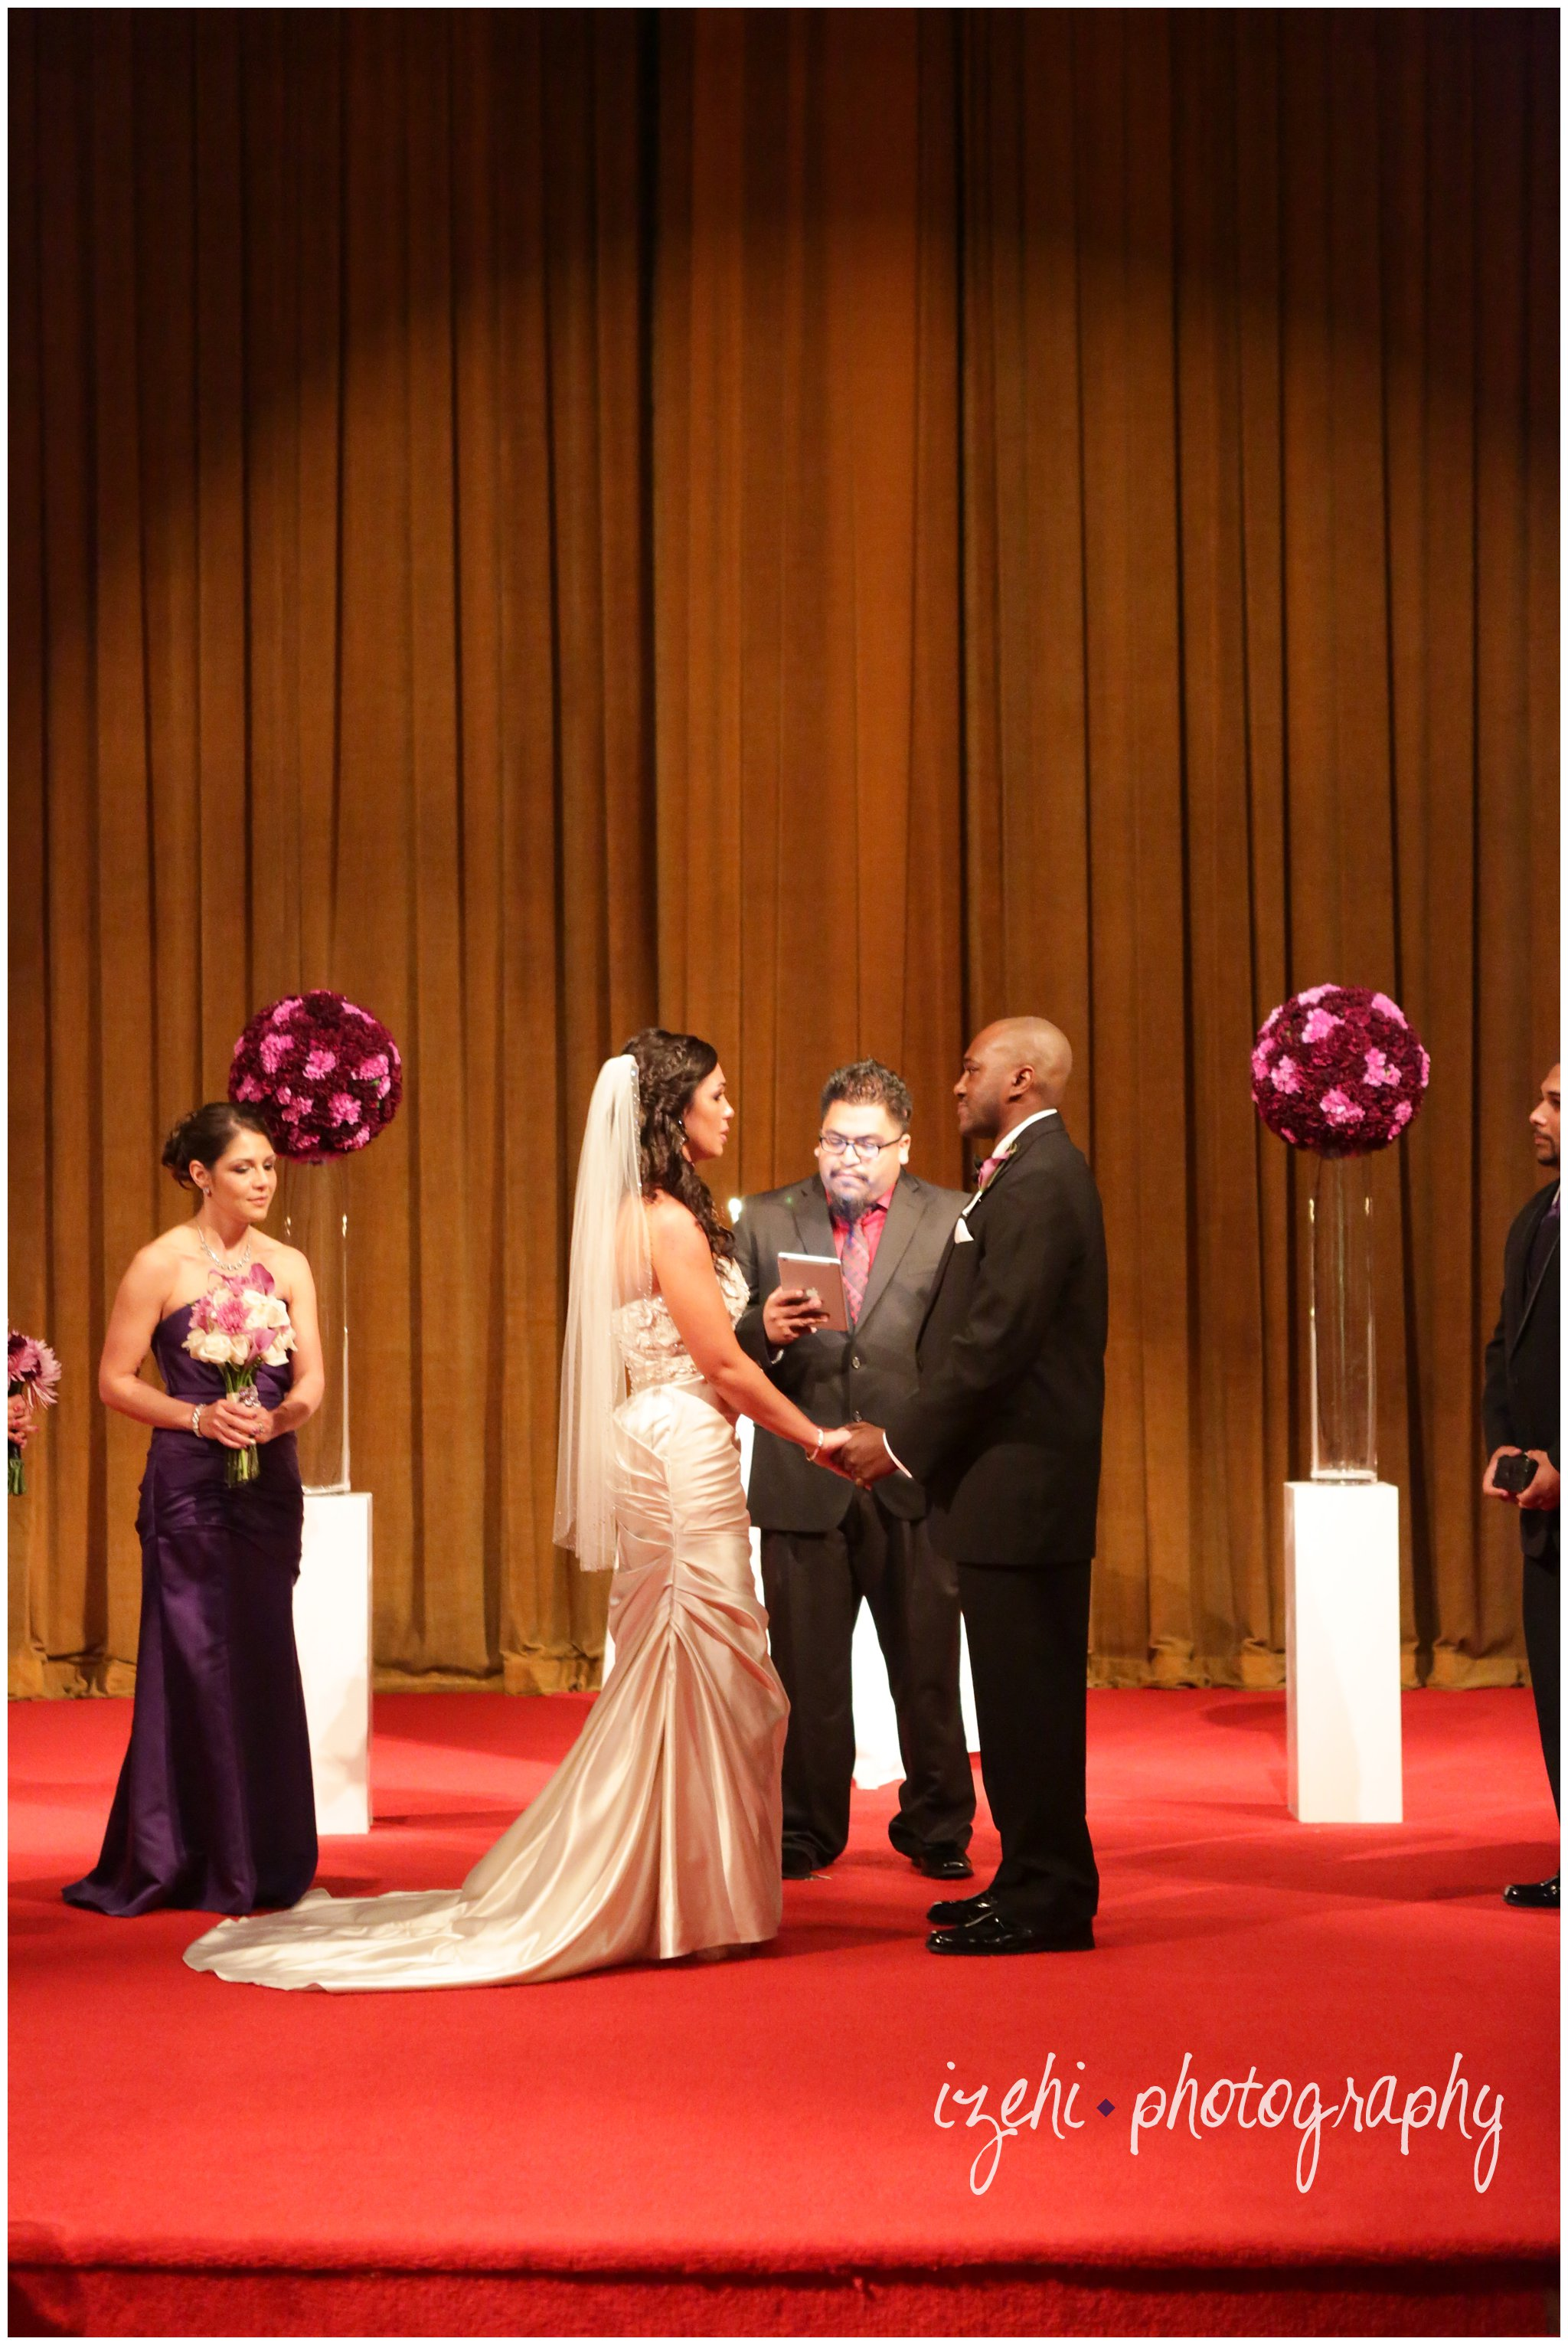 Izehi Photography Nigerian Weddings_0037.jpg